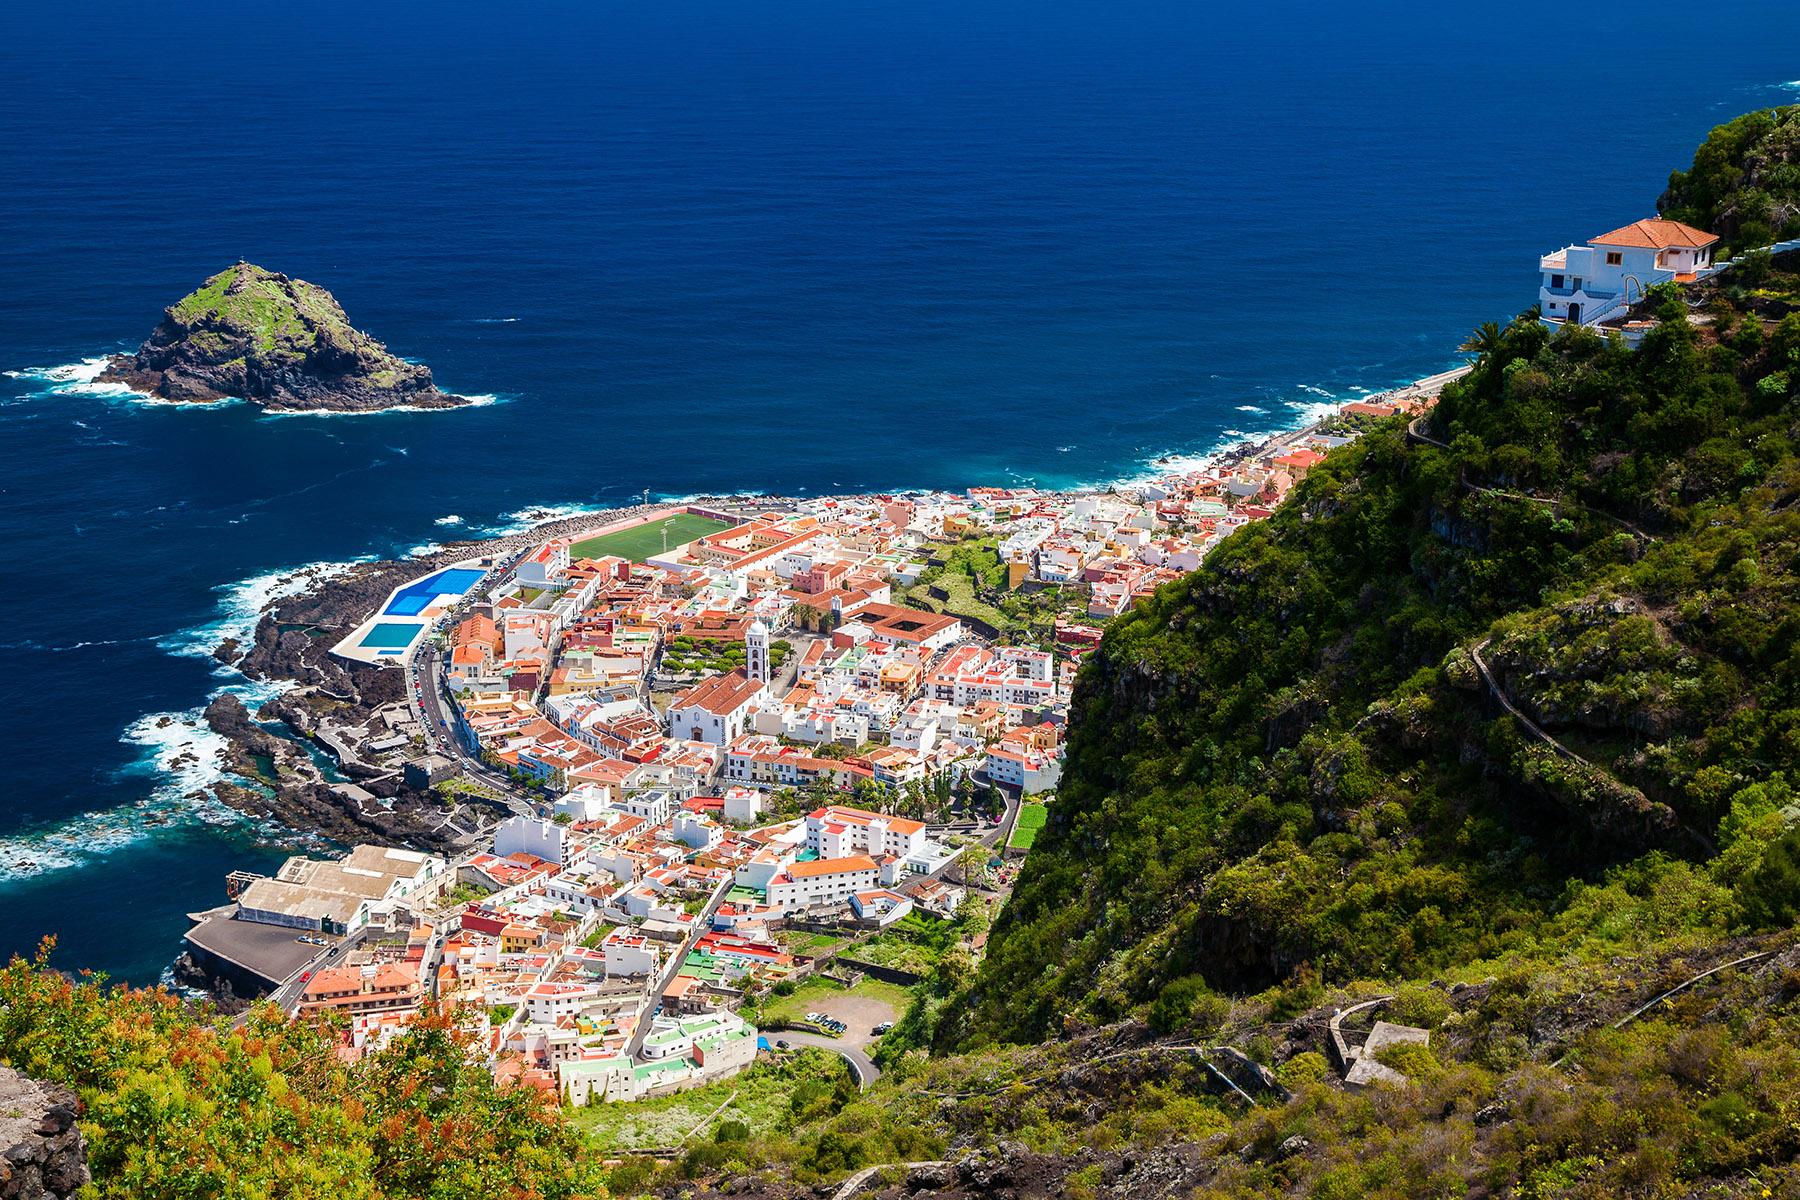 Garachico in the Canary Islands